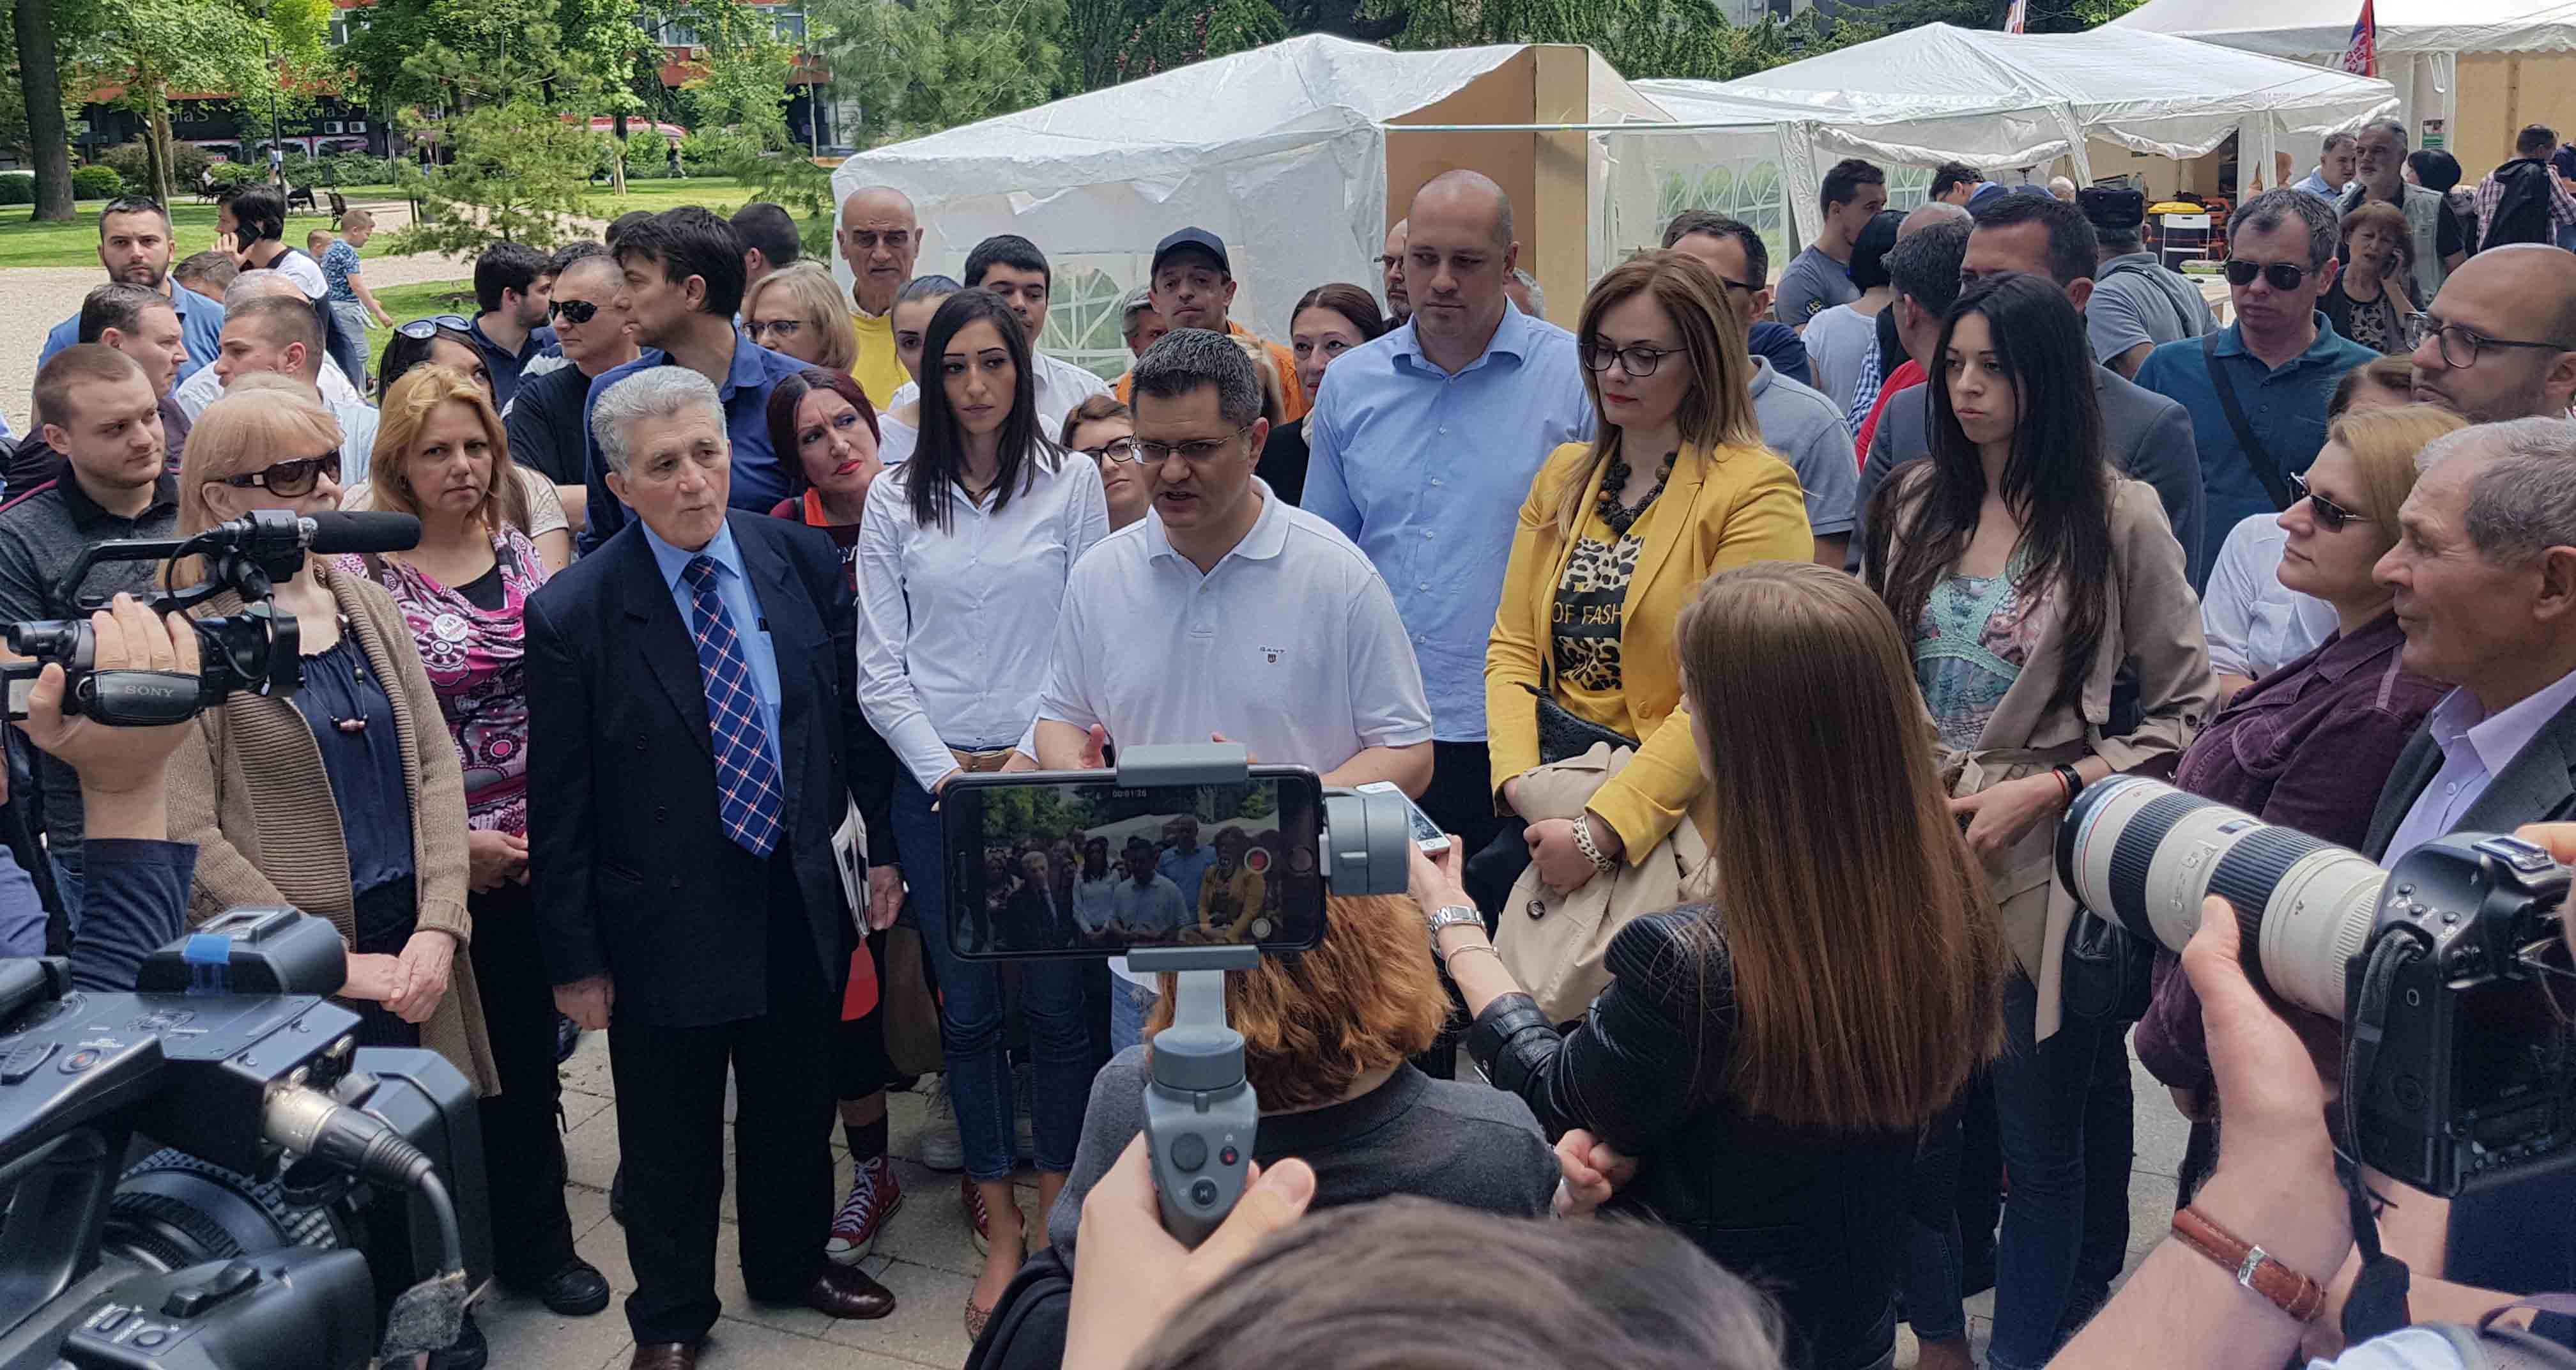 Јеремић: Ако Вучић поднесе писмени извештај, Народна странка спремна да размотри учествовање на седници парламента о Косову